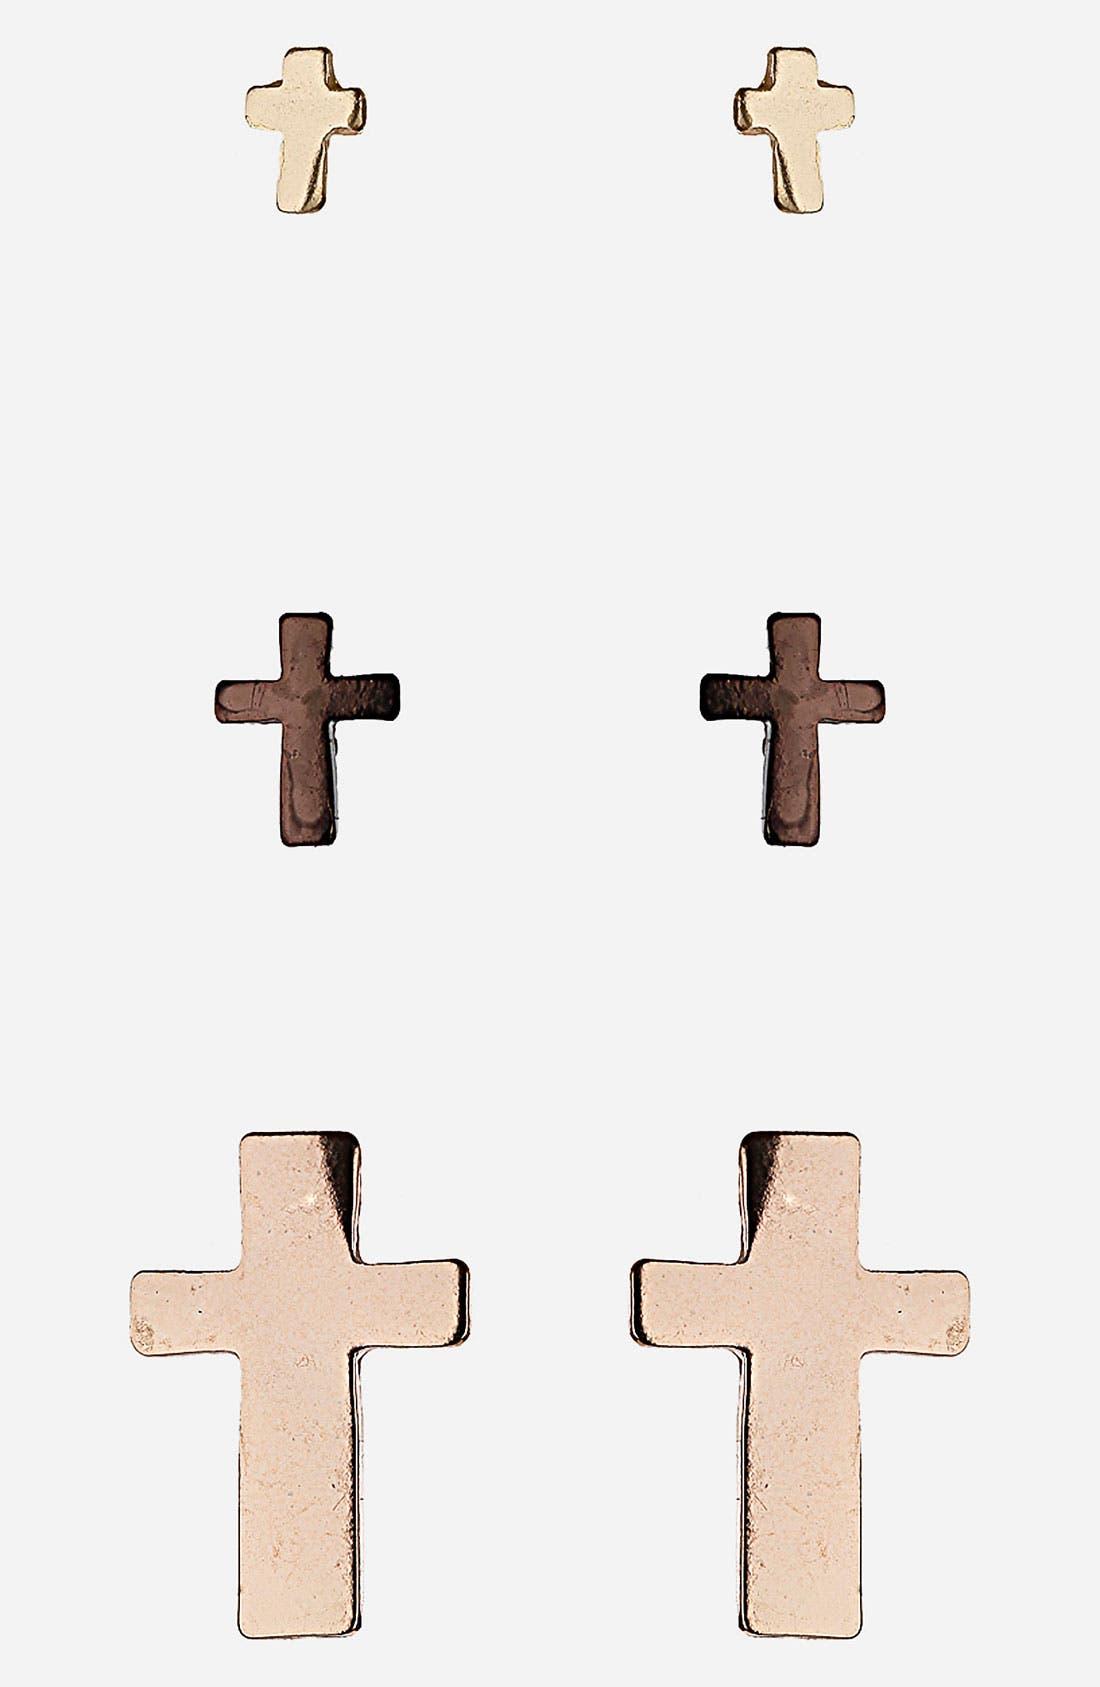 Alternate Image 1 Selected - Topshop 'Ditsy Crosses' Assorted Stud Earrings (Set of 3)